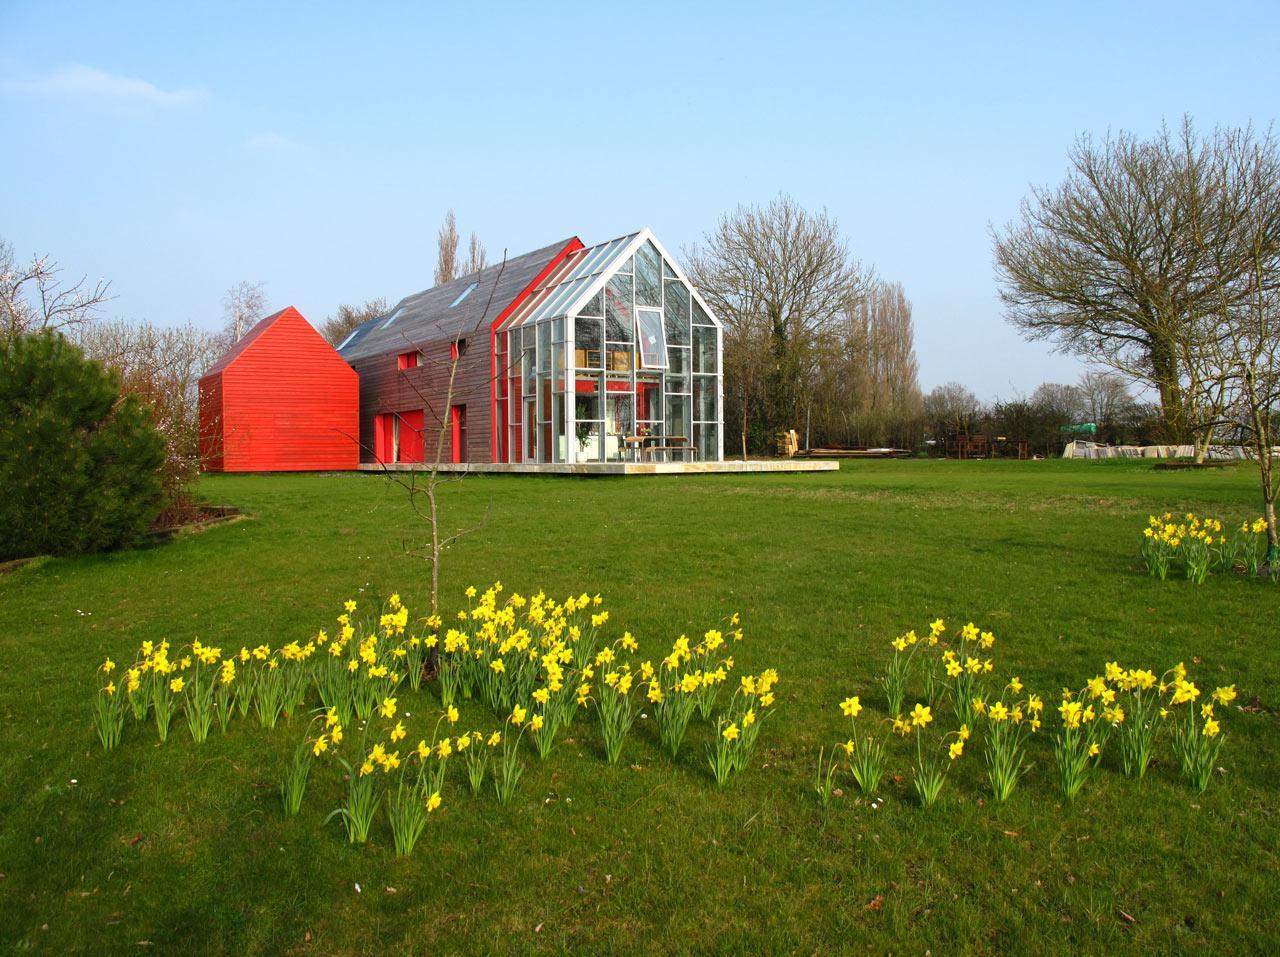 Sliding-House-dRMM-de-Rijke-Marsh-Morgan-Architects-3